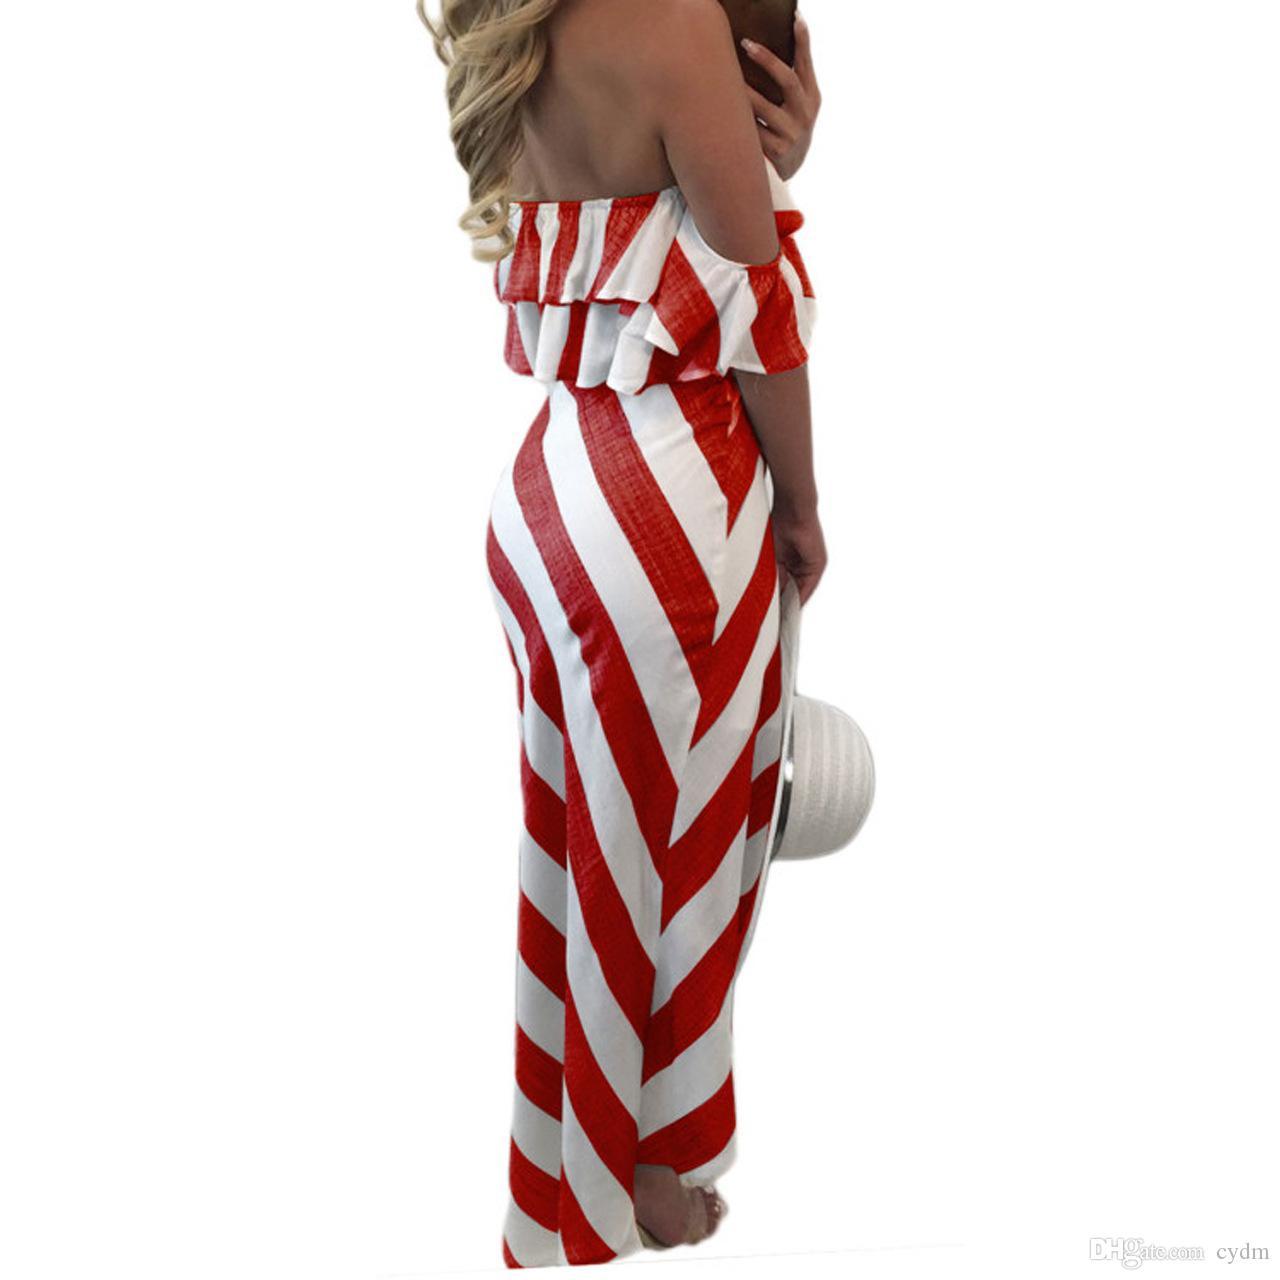 Moda europeia sexy wipes exposto folha de lótus lado cinto listrado vestido S, M, L, XL apoio misturado lote